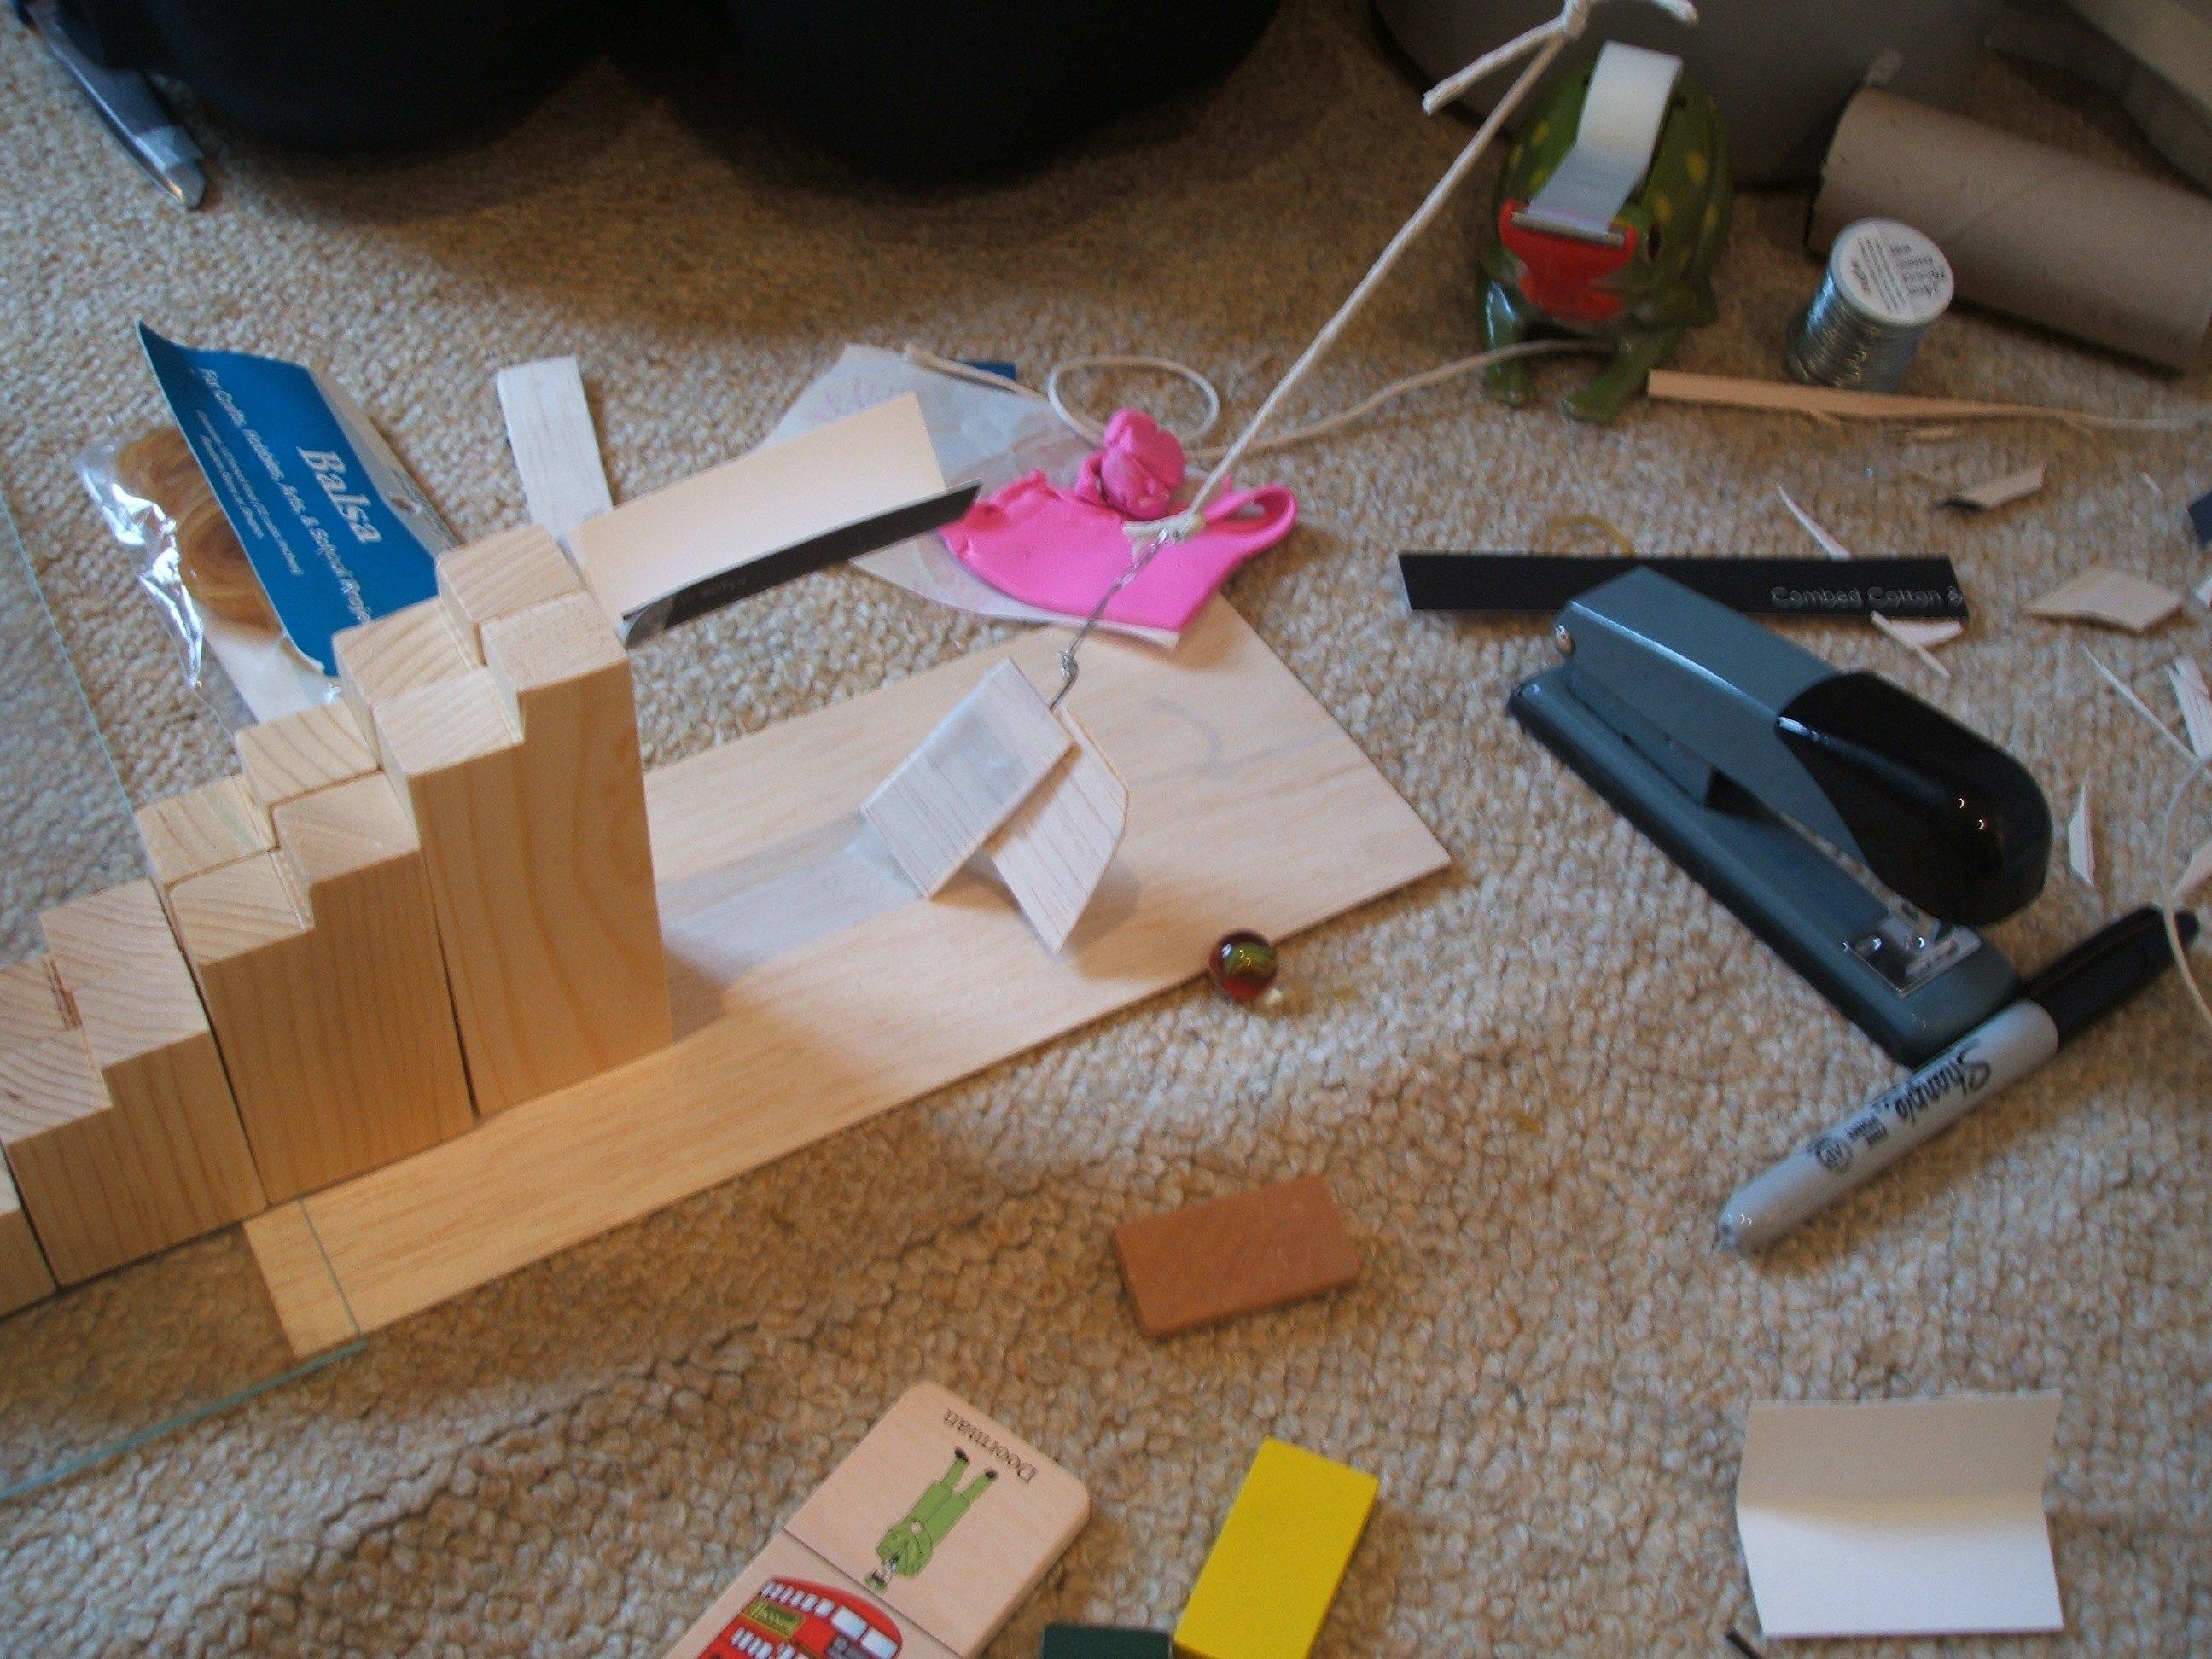 10 Lovely Ideas For A Rube Goldberg Machine building a rube goldberg machine jabberwacky 1 2020